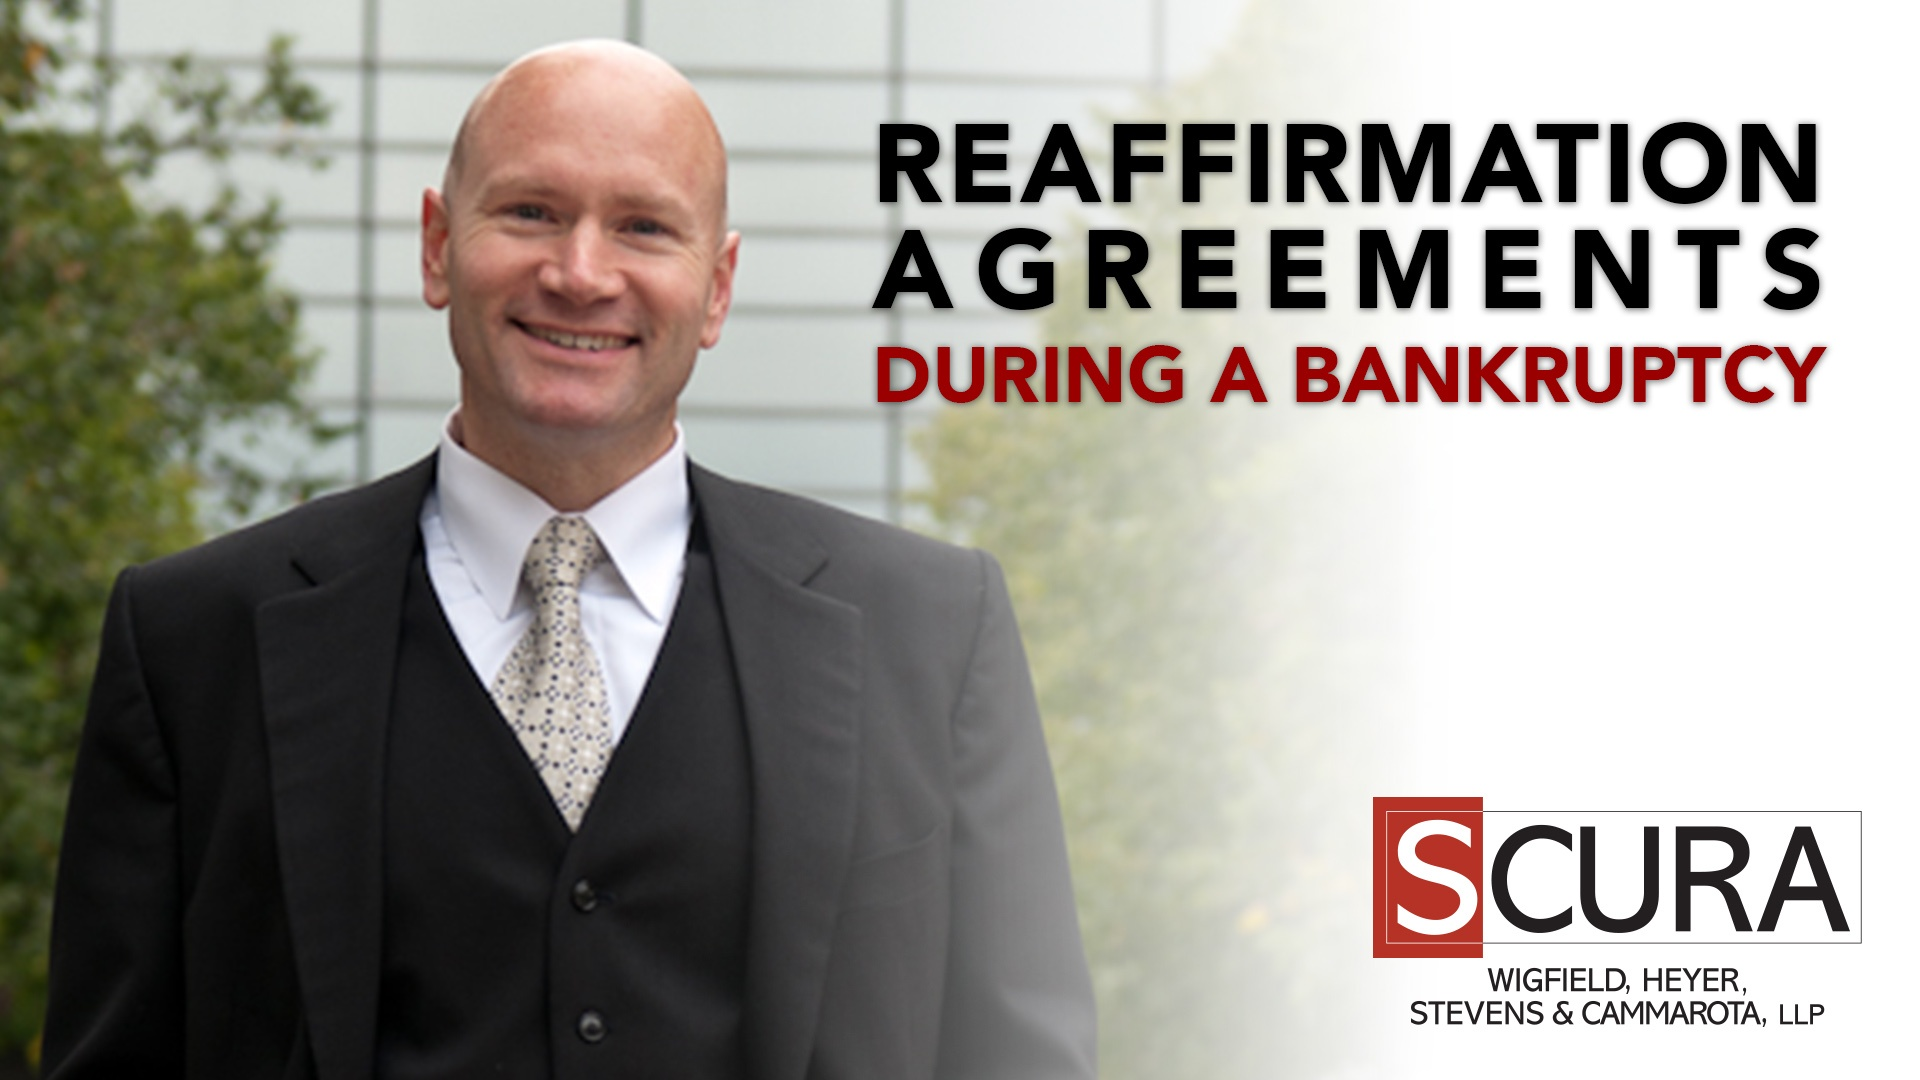 Reaffirmation-agreements.jpg